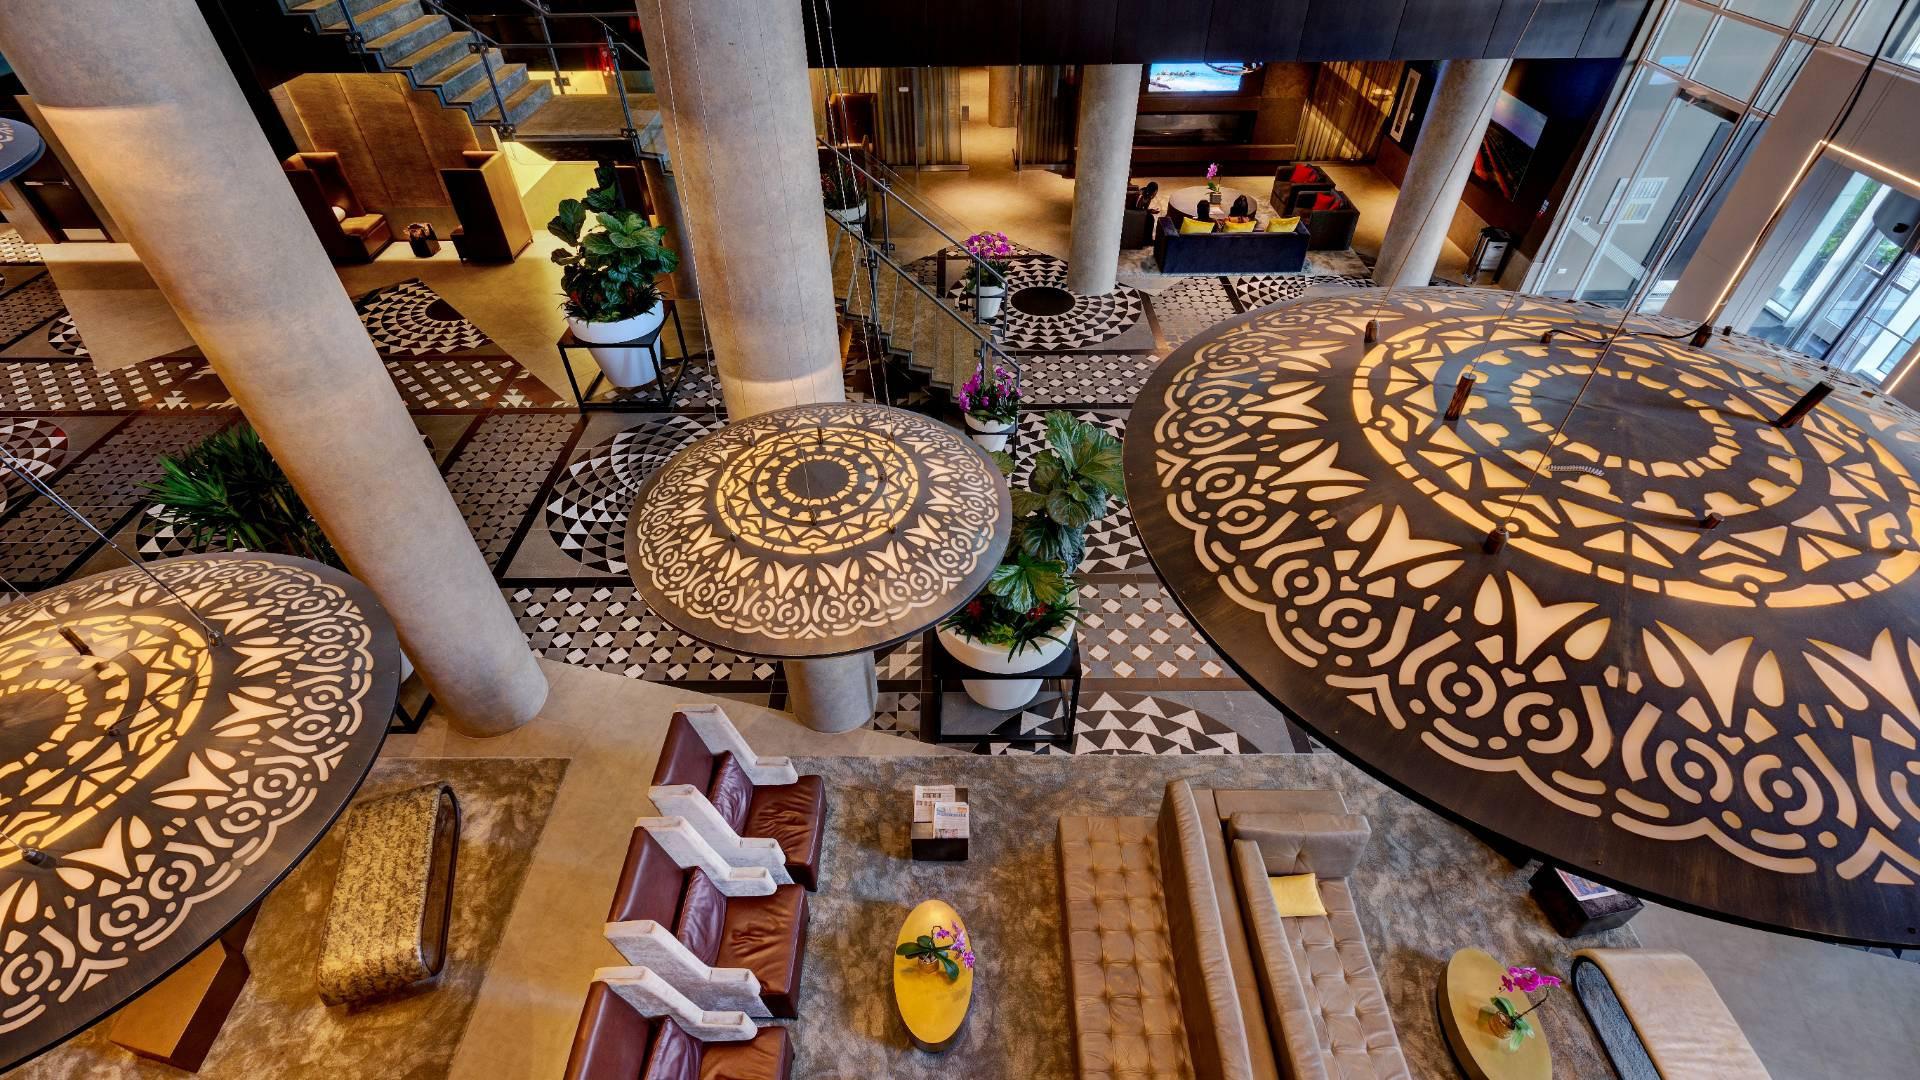 Best hotels Toronto staycation | Hotel X main entrance lobby